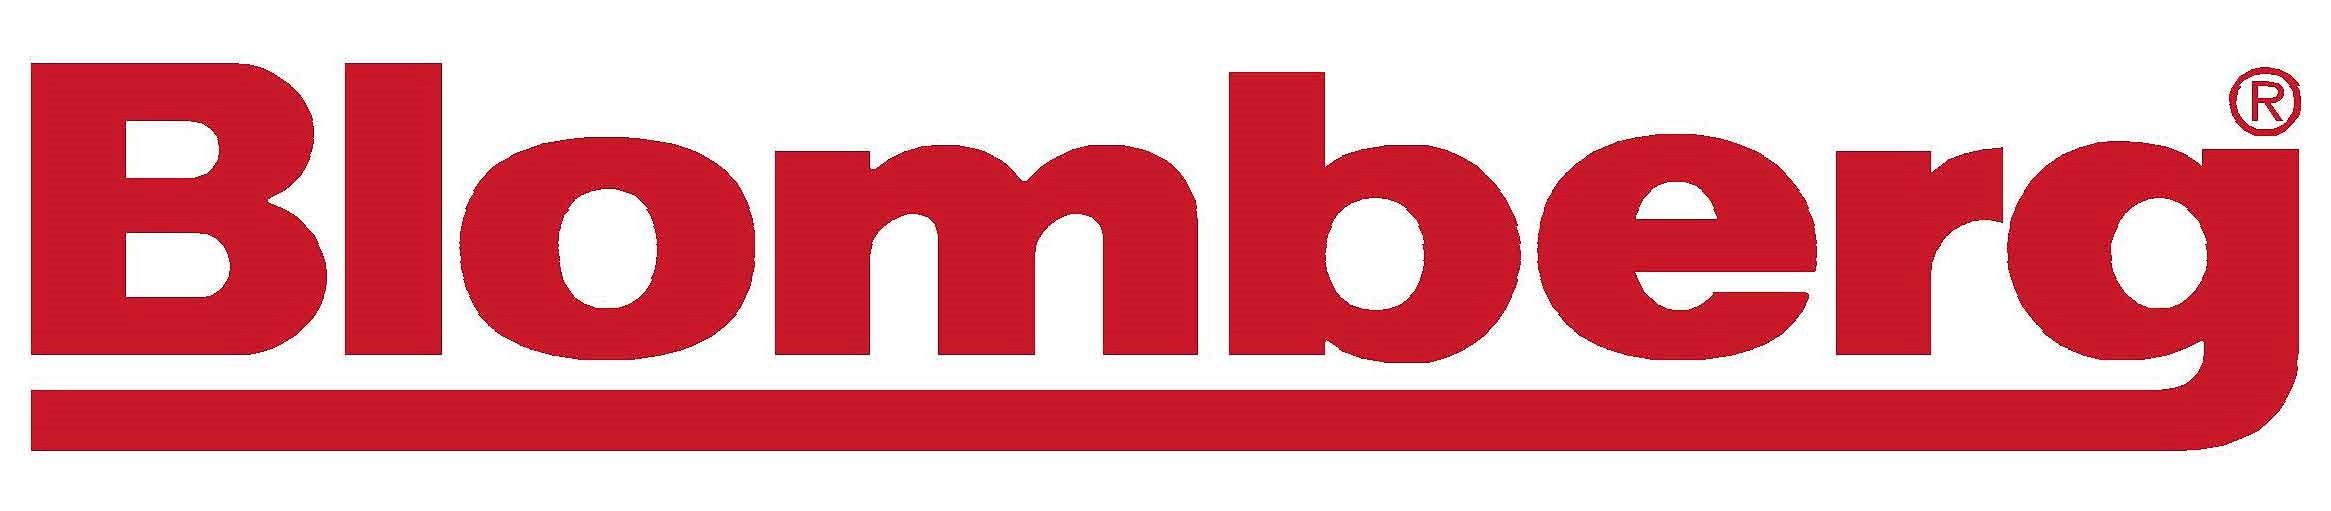 Blomberg News